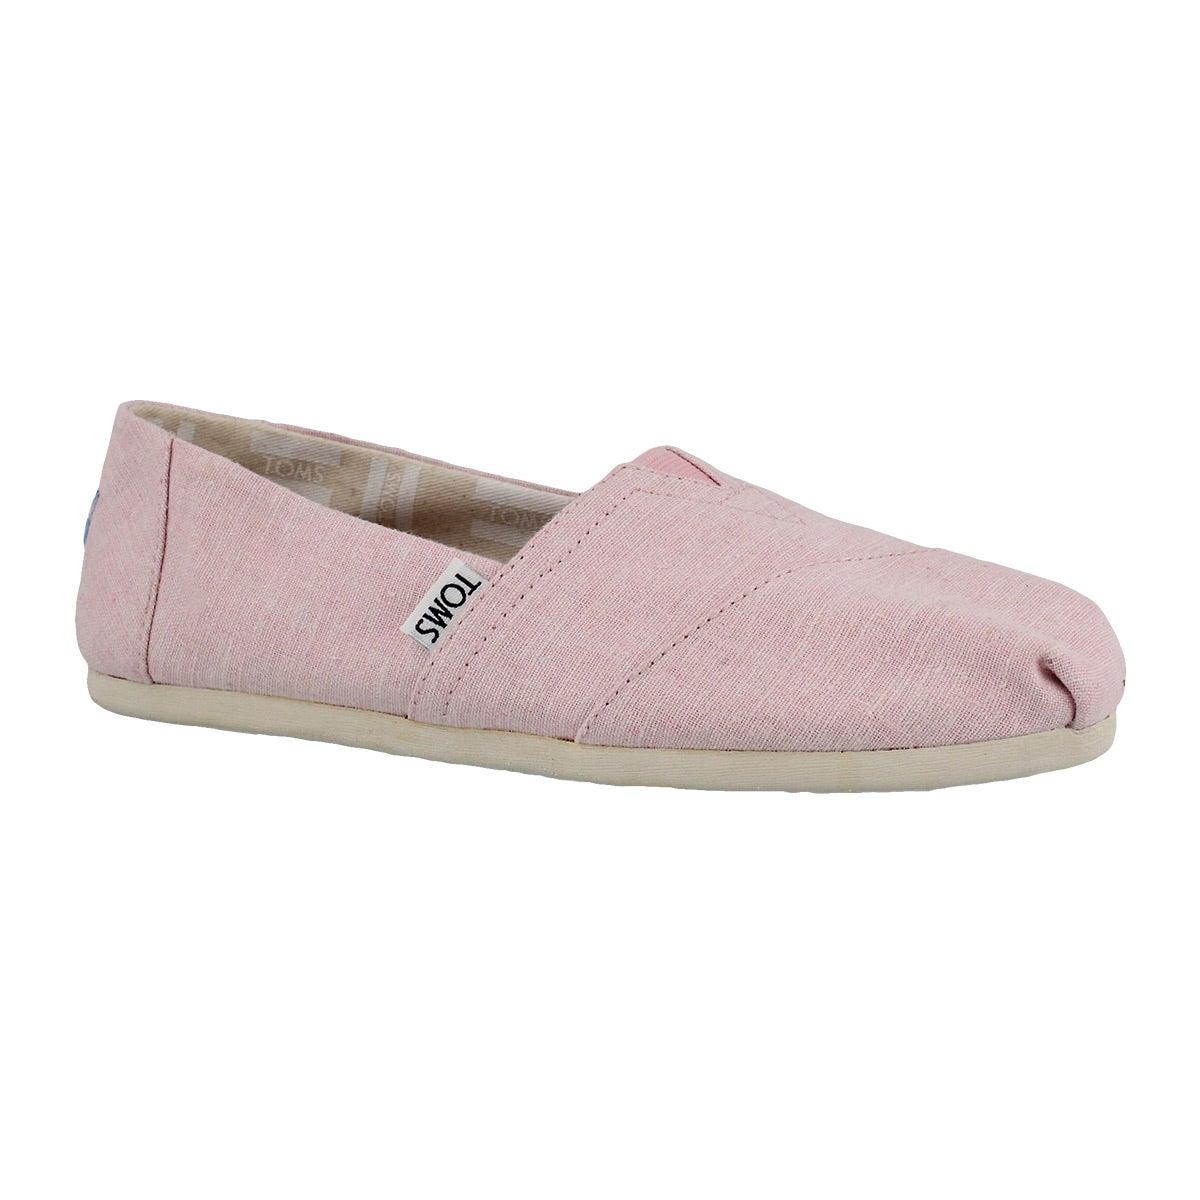 Women's SEASONAL CLASSIC blossom slub loafers